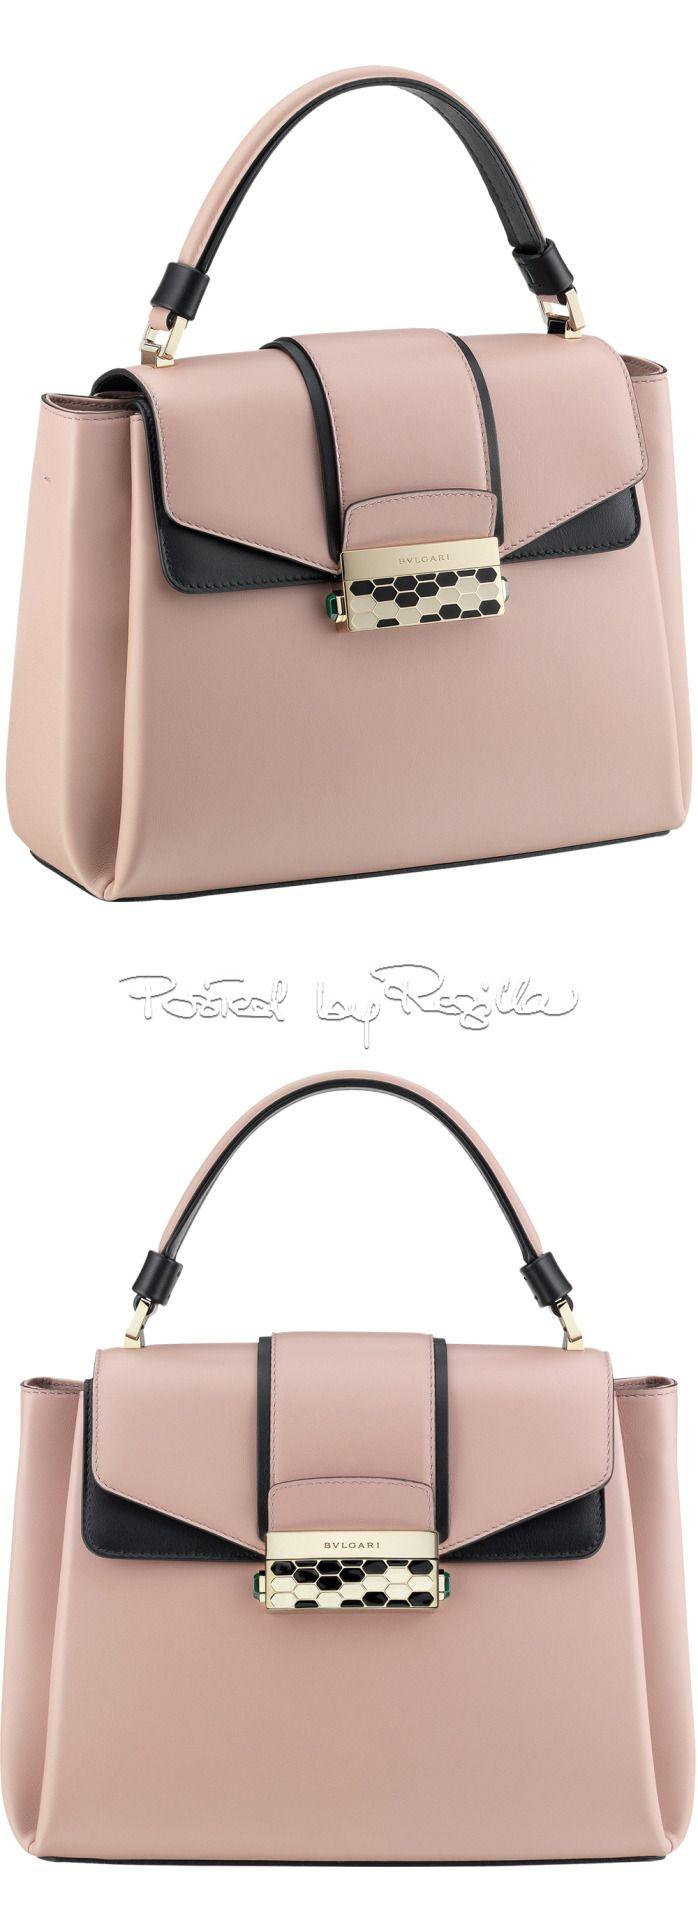 Handbags Wallets Regilla Bulgari Roma Women Fashion And Latest Hand Bags Usa At Cornerstone How Should We Combine